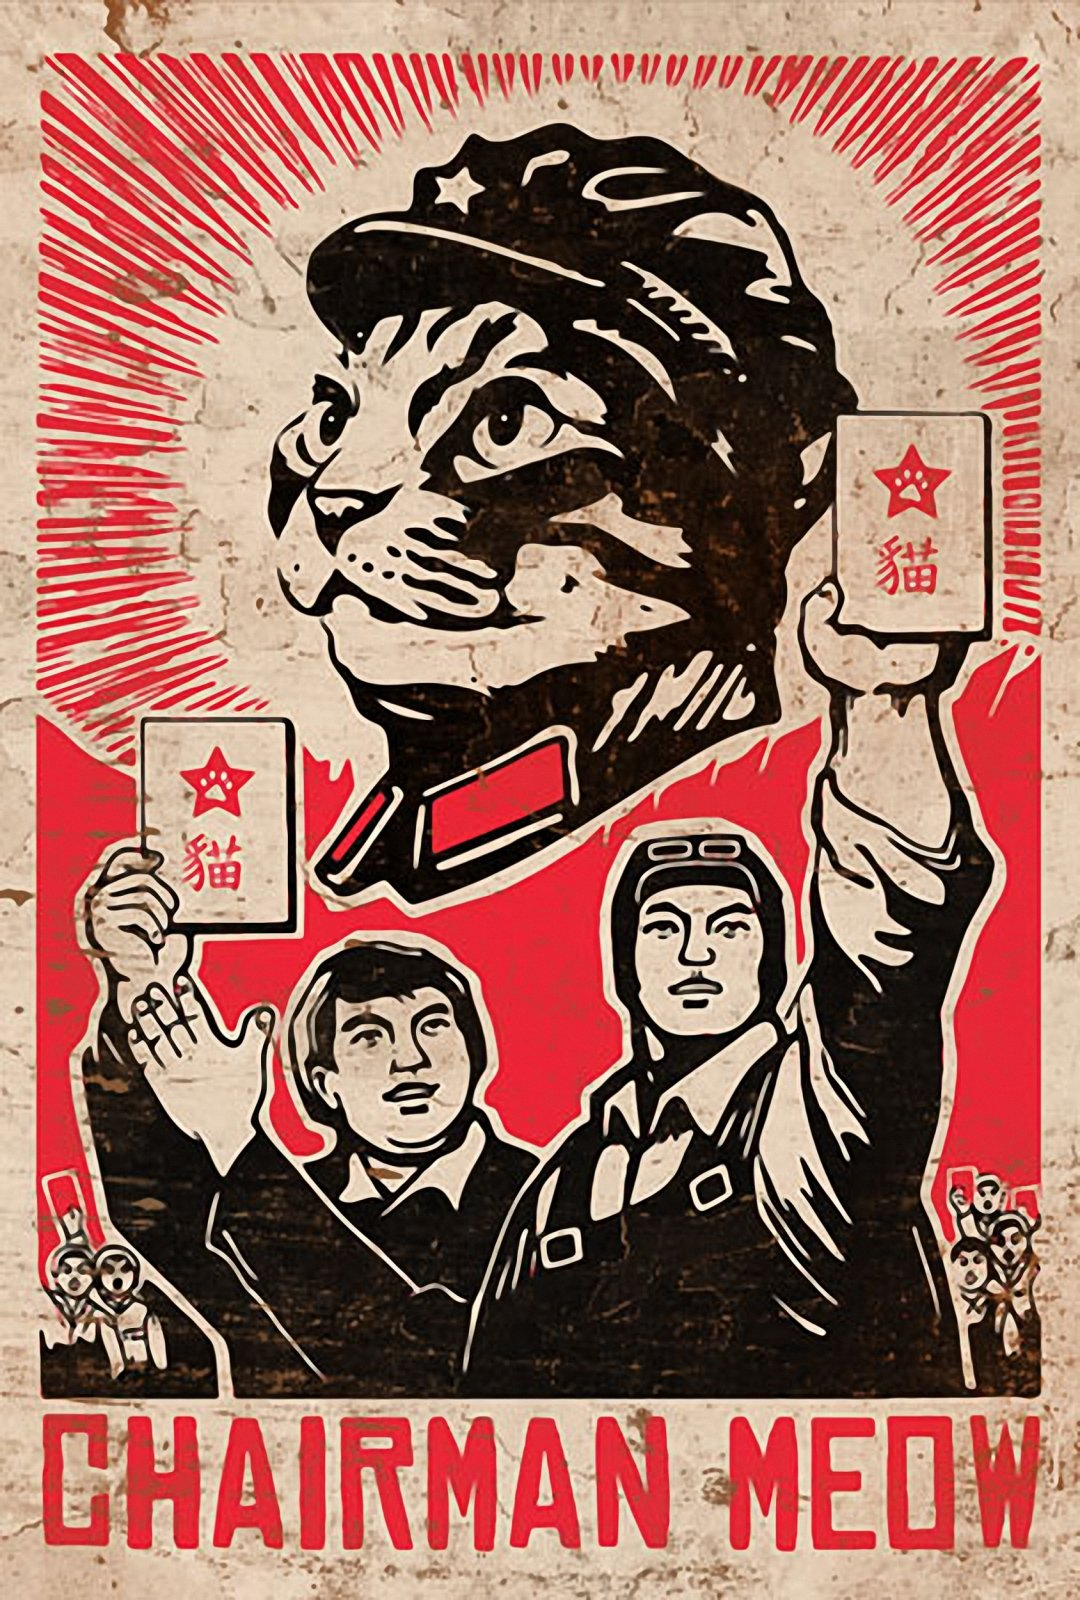 chairman_meow_poster.jpg